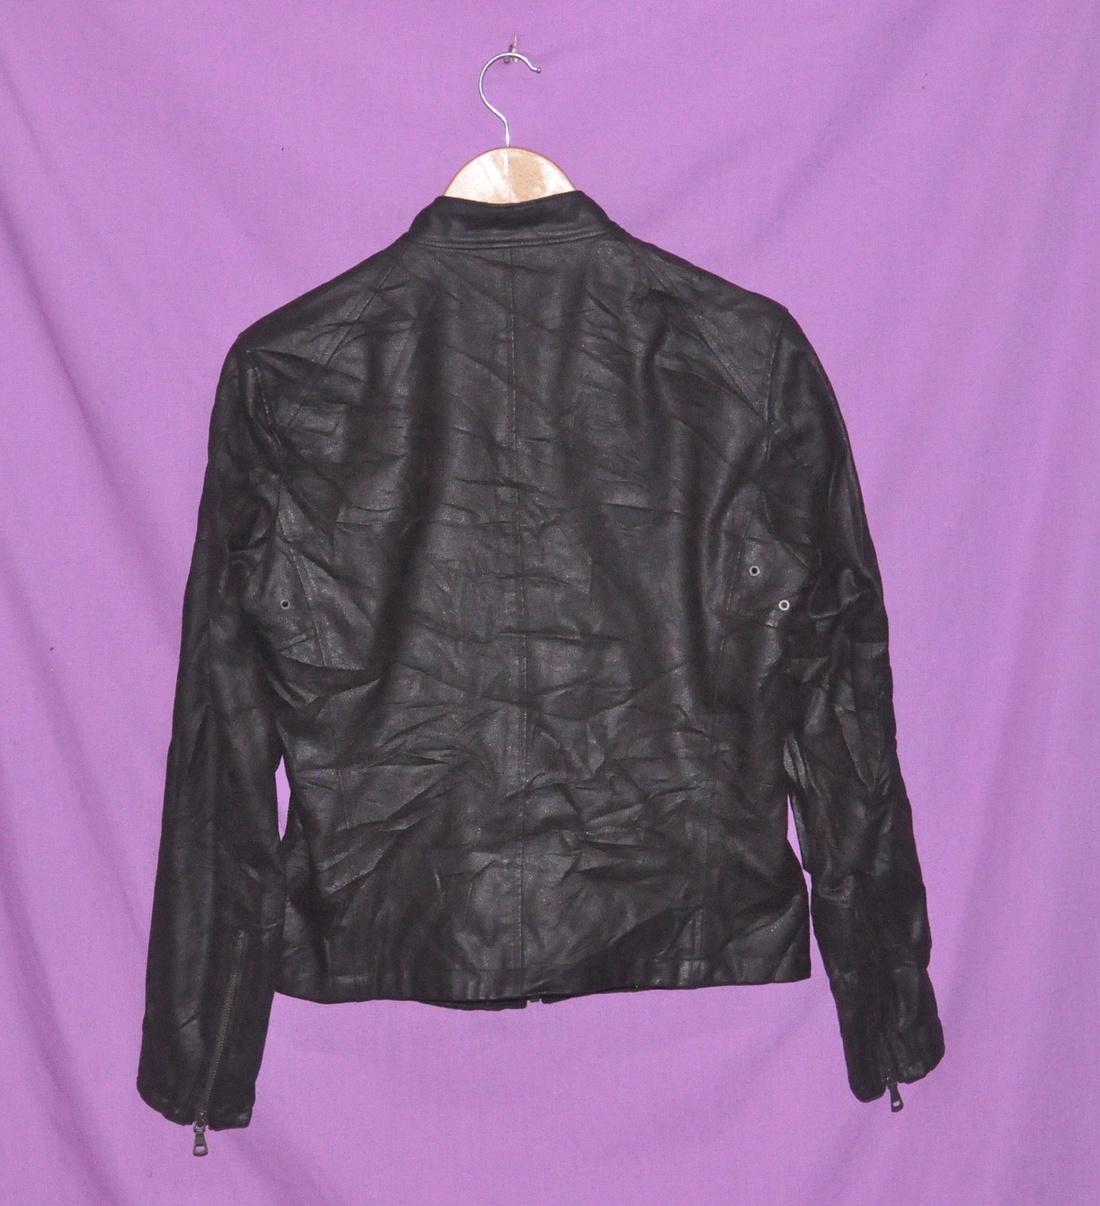 Leather jacket uniqlo -  Uniqlo Uniqlo Leather Jacket Size Us S Eu 44 46 1 4